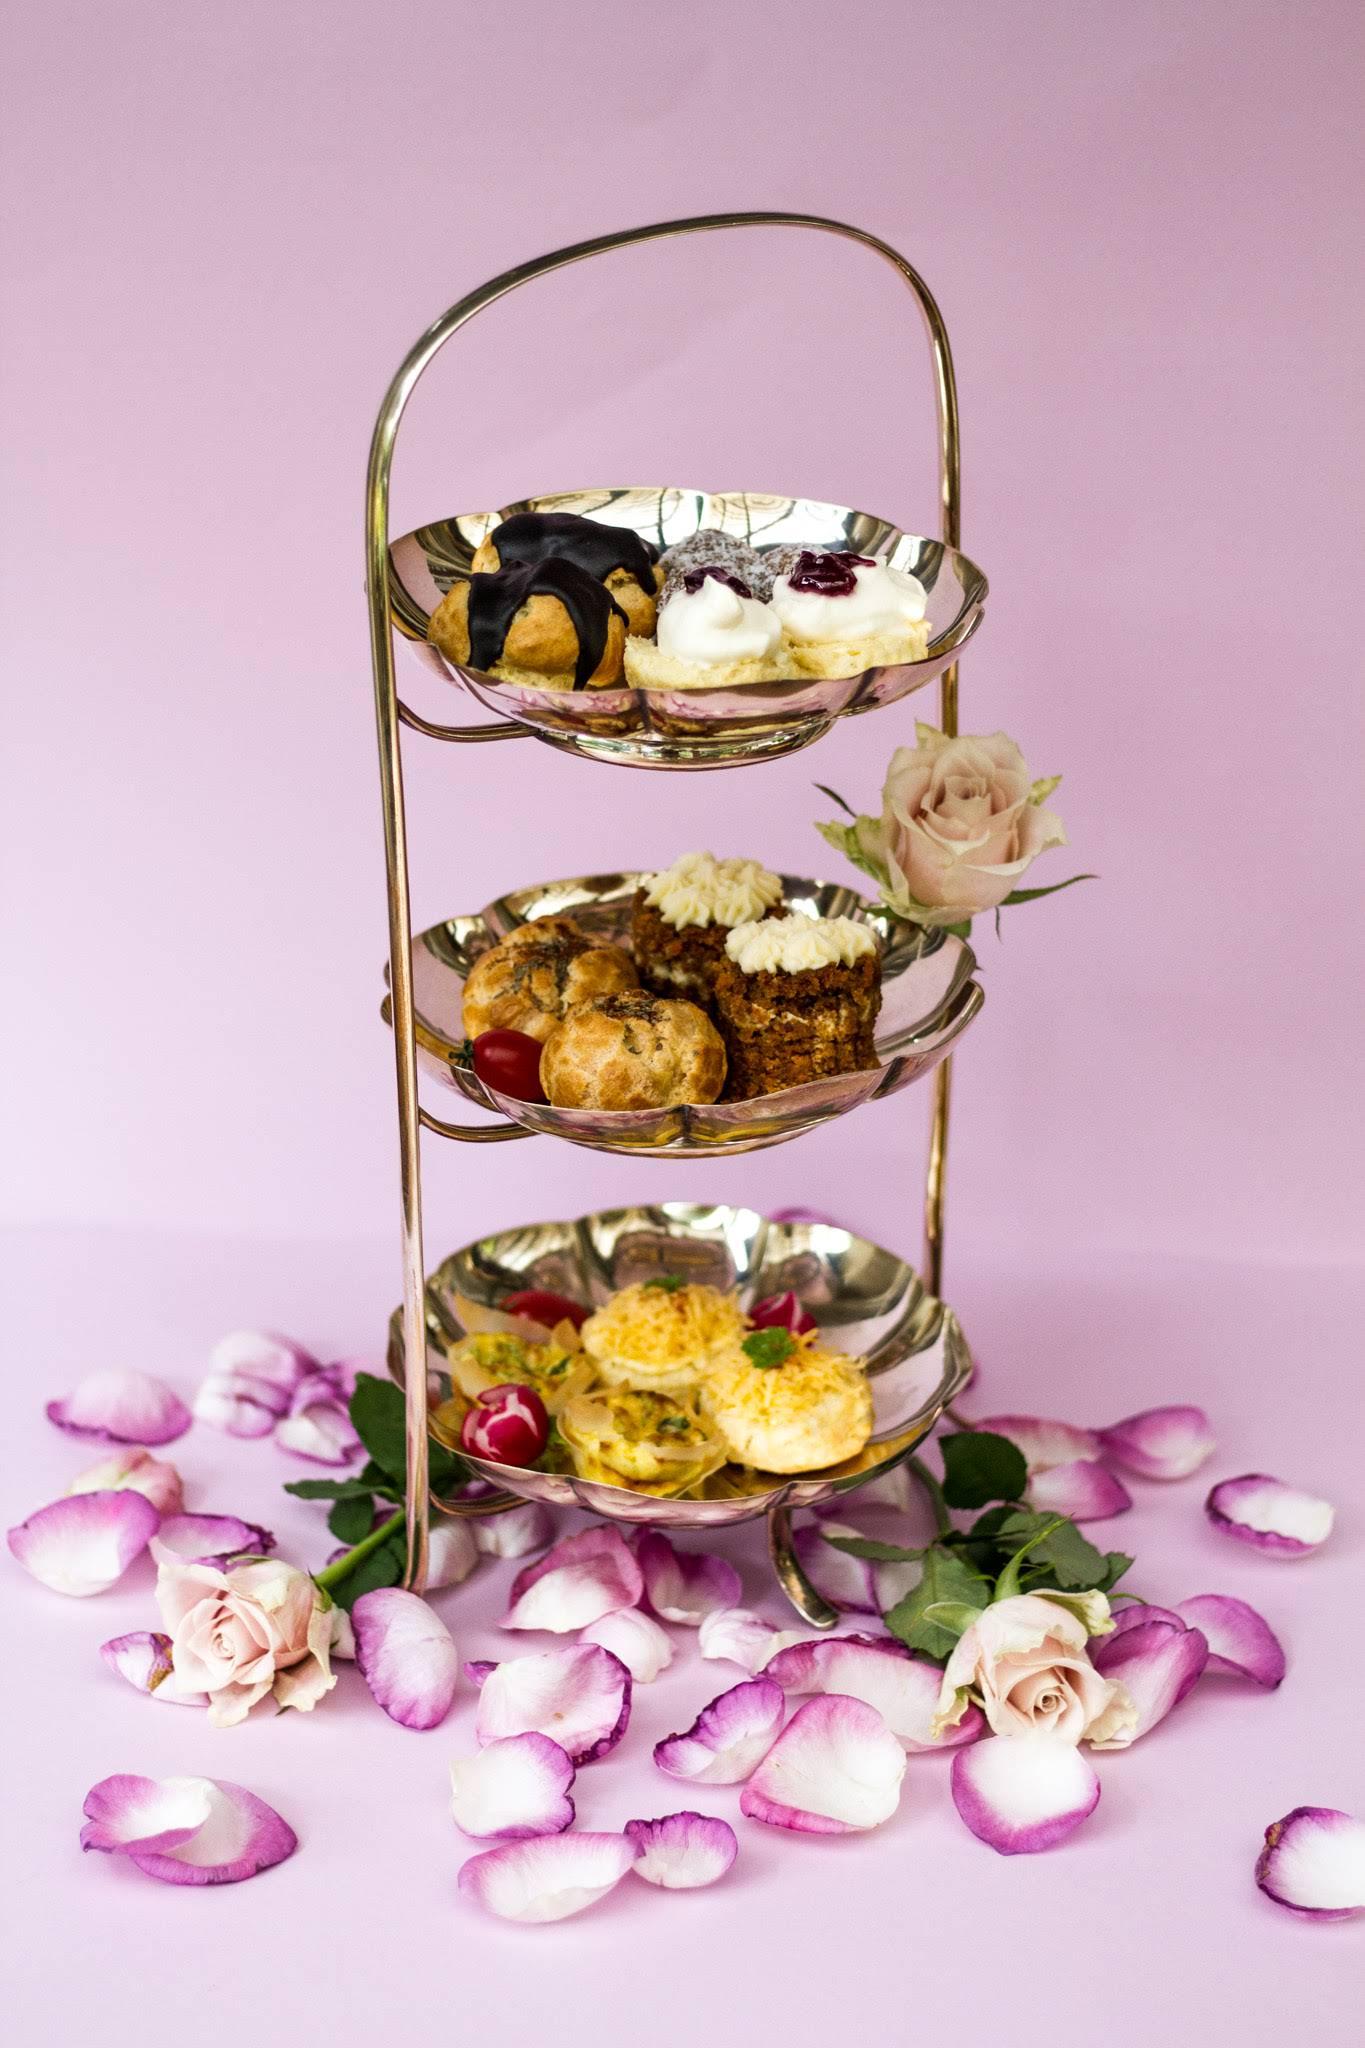 Platters served as high tea